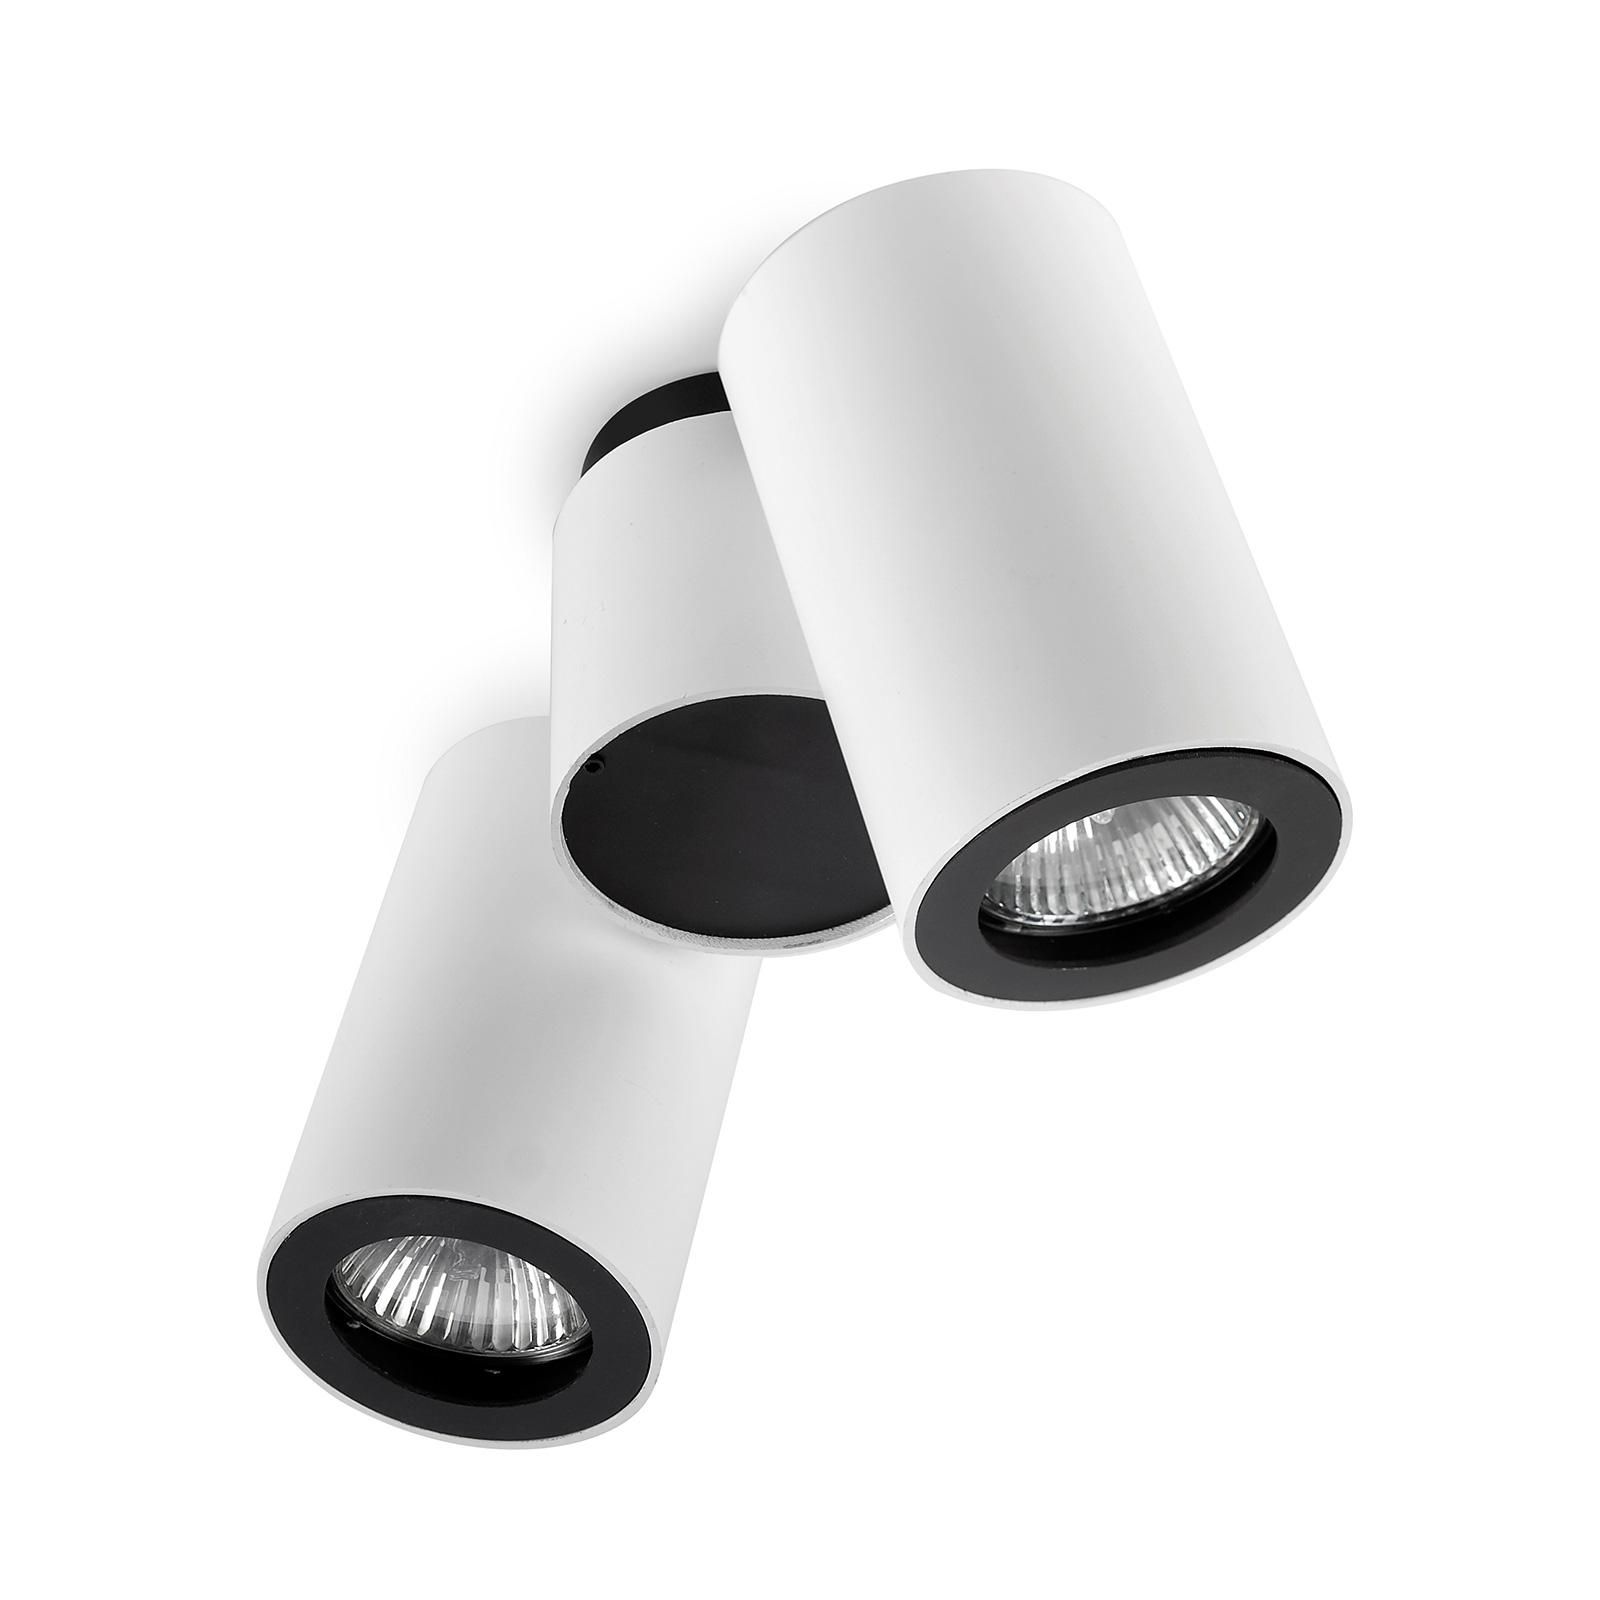 LEDS-C4 Pipe takspot 2 lyskilder hvit-svart